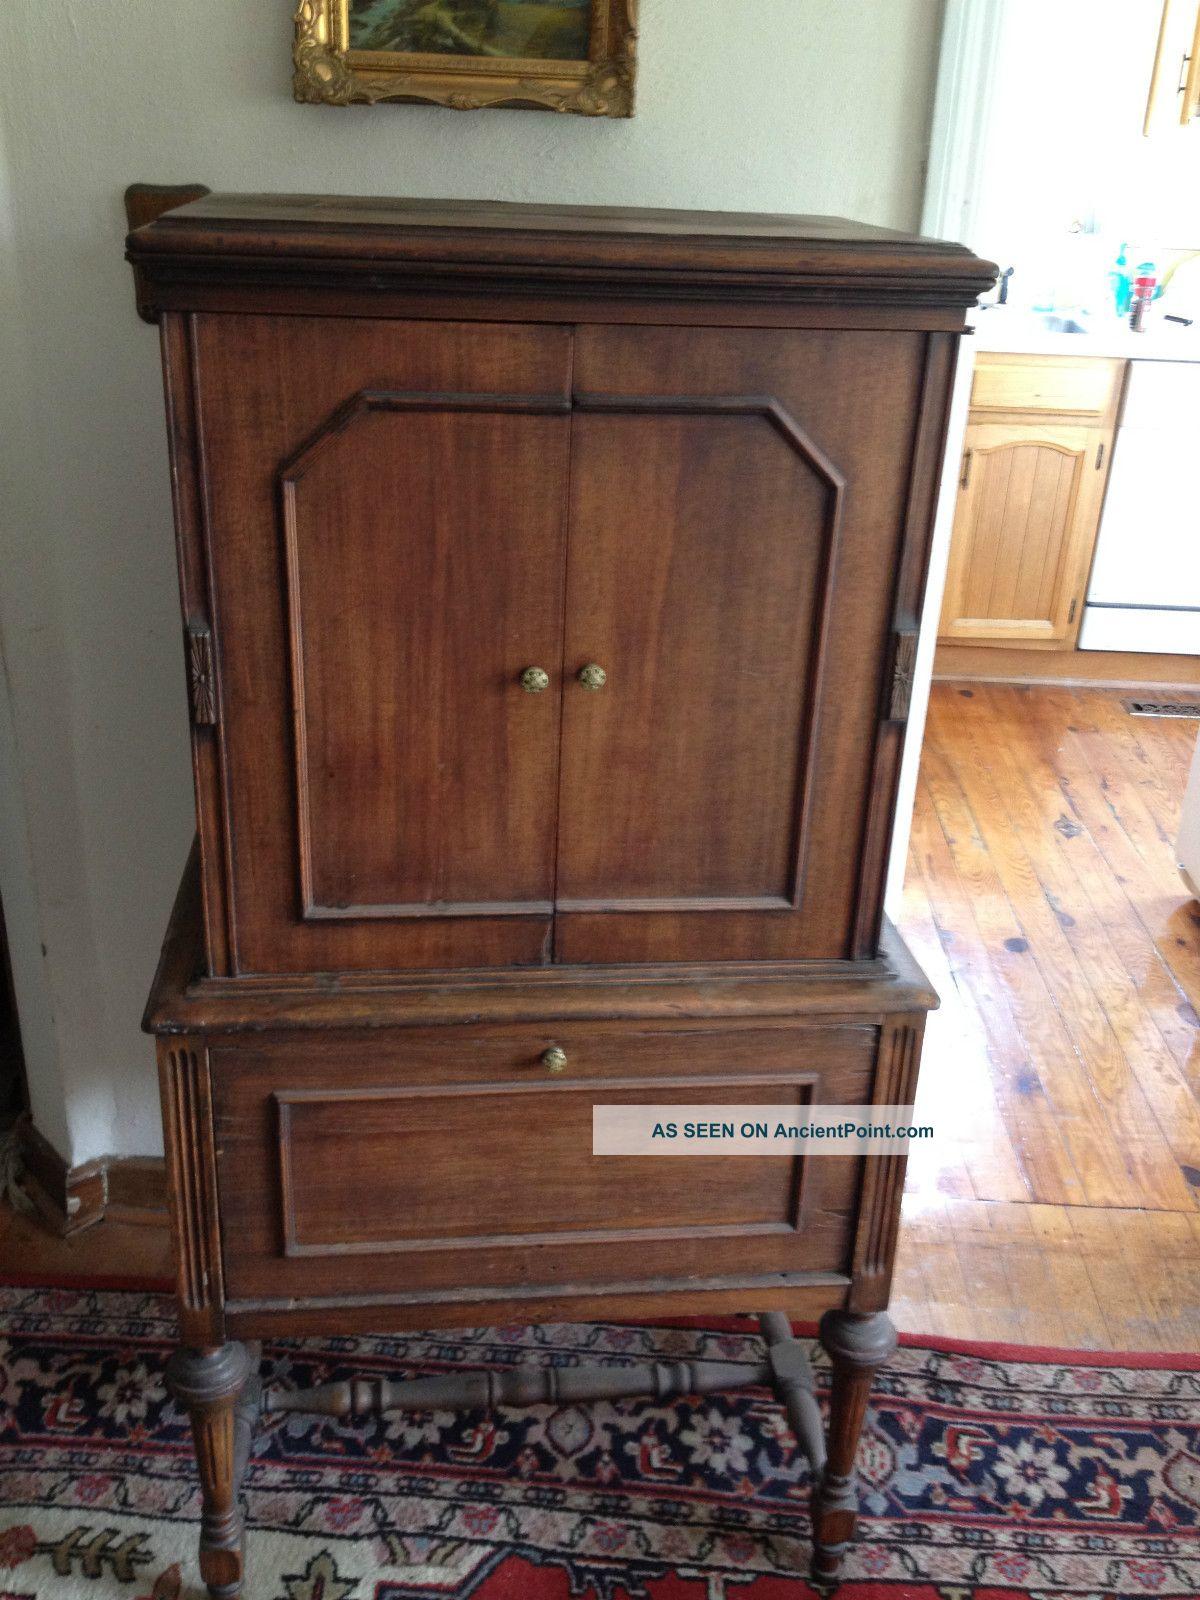 ... Vintage Radio 1950 Photo Cabinet Radio 1900 Antique Cabinets Kolster ...